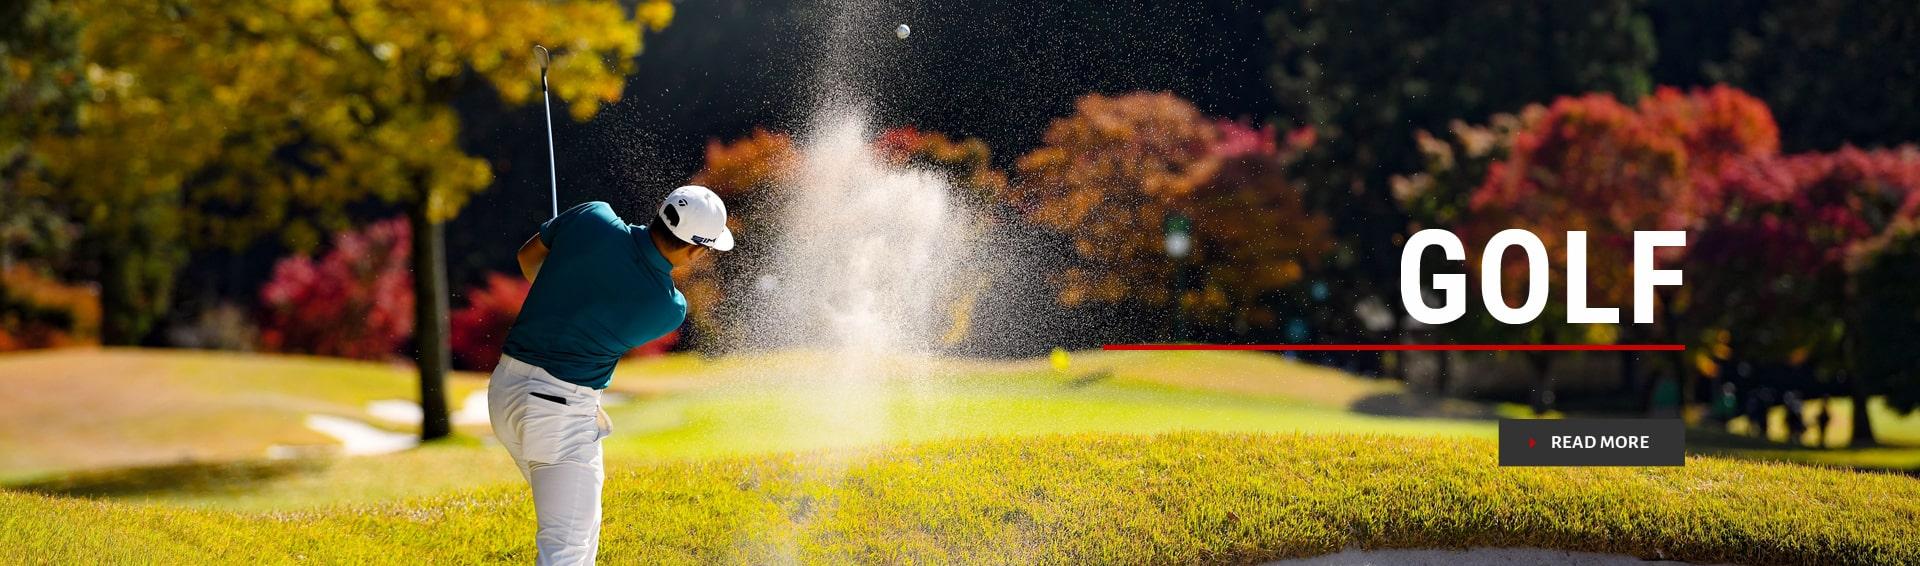 /top_golf_mv_pc_19fw.jpg